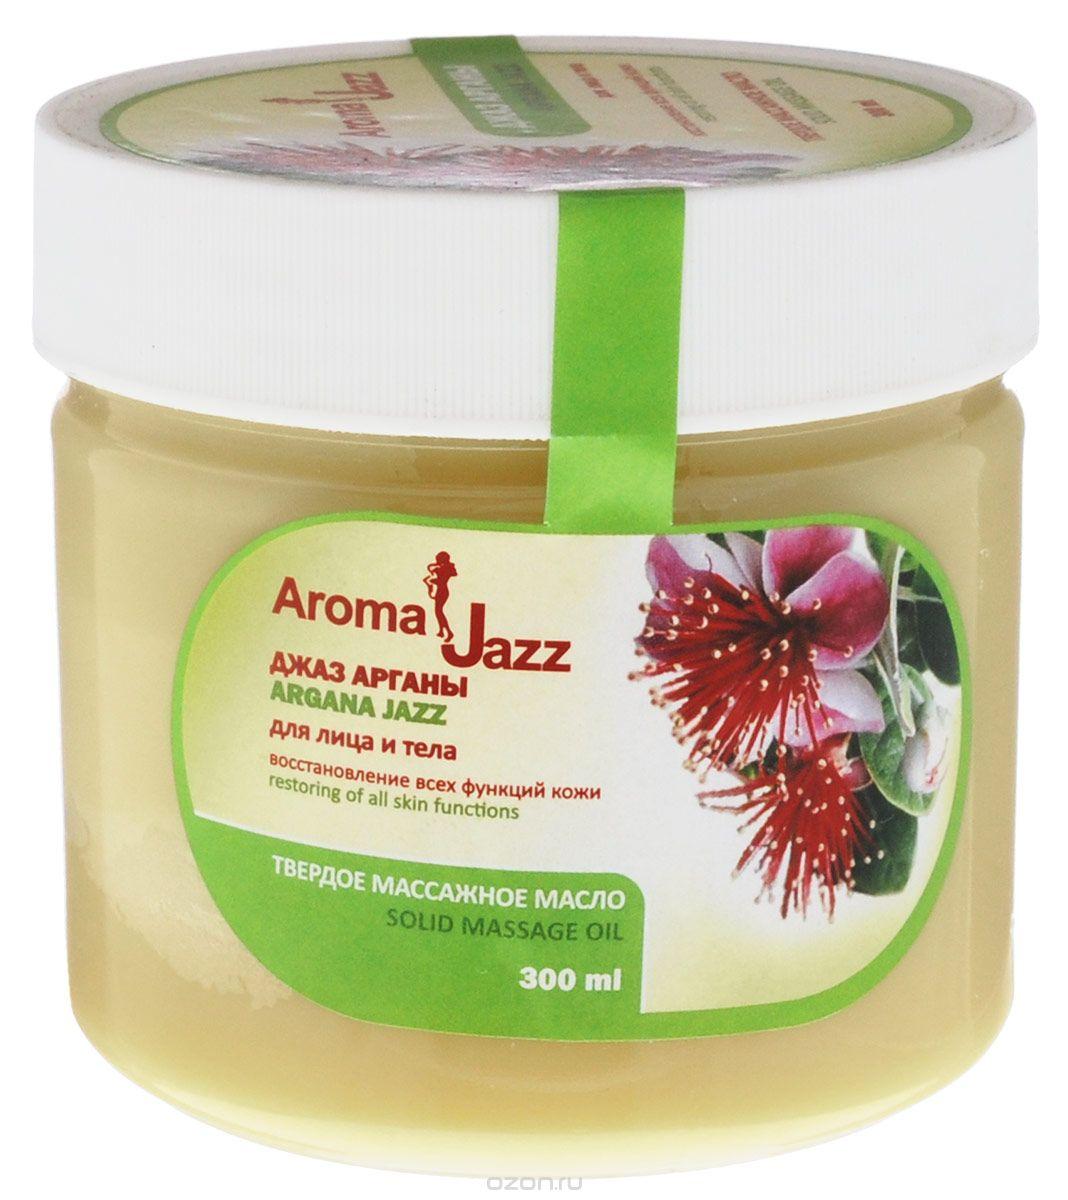 Aroma Jazz Твердое масло питательное Джаз арганы, 300 мл aroma jazz твердое масло антицеллюлитное грейпфрут 300 мл